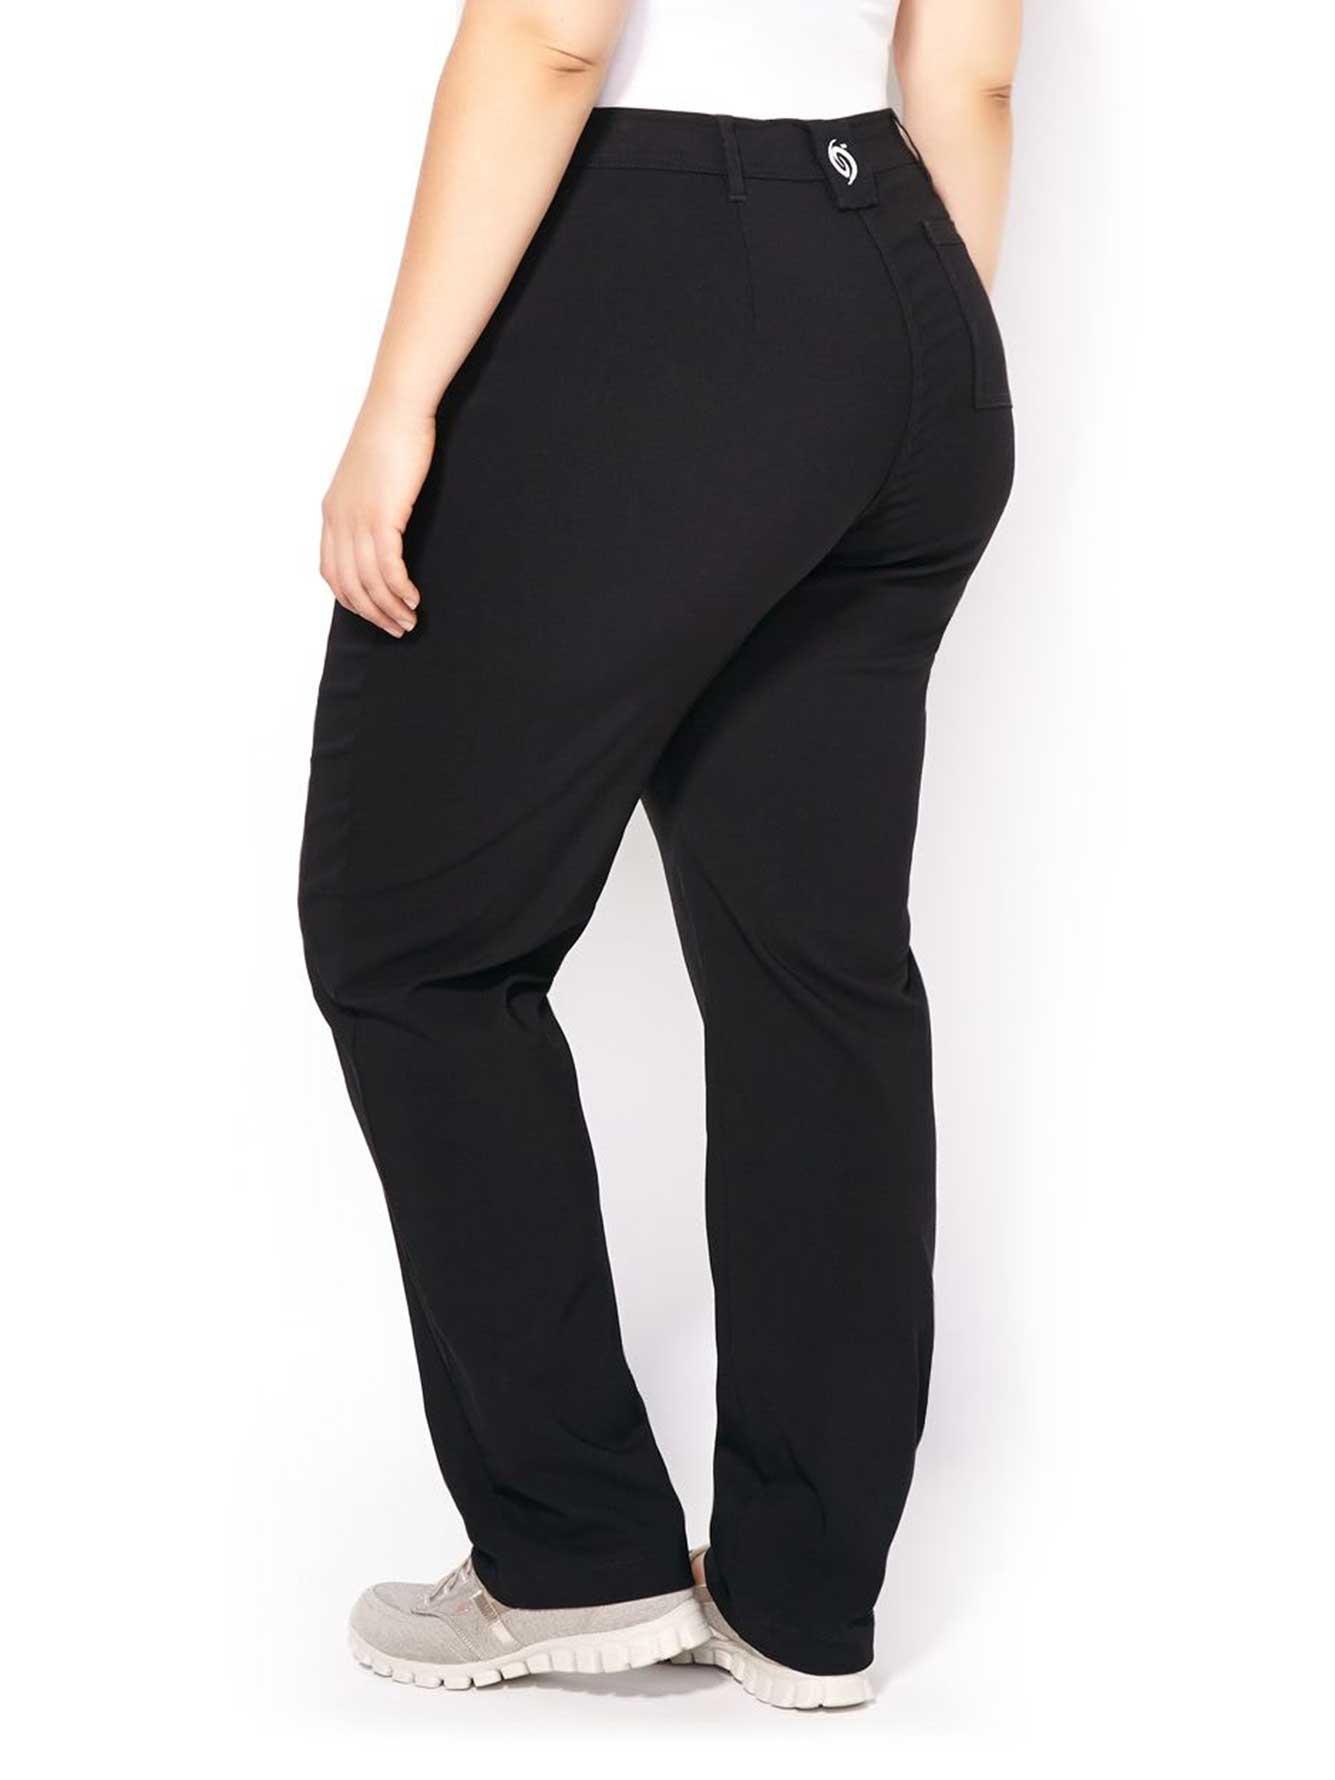 activezone golf pantalon taille plus en serg penningtons. Black Bedroom Furniture Sets. Home Design Ideas